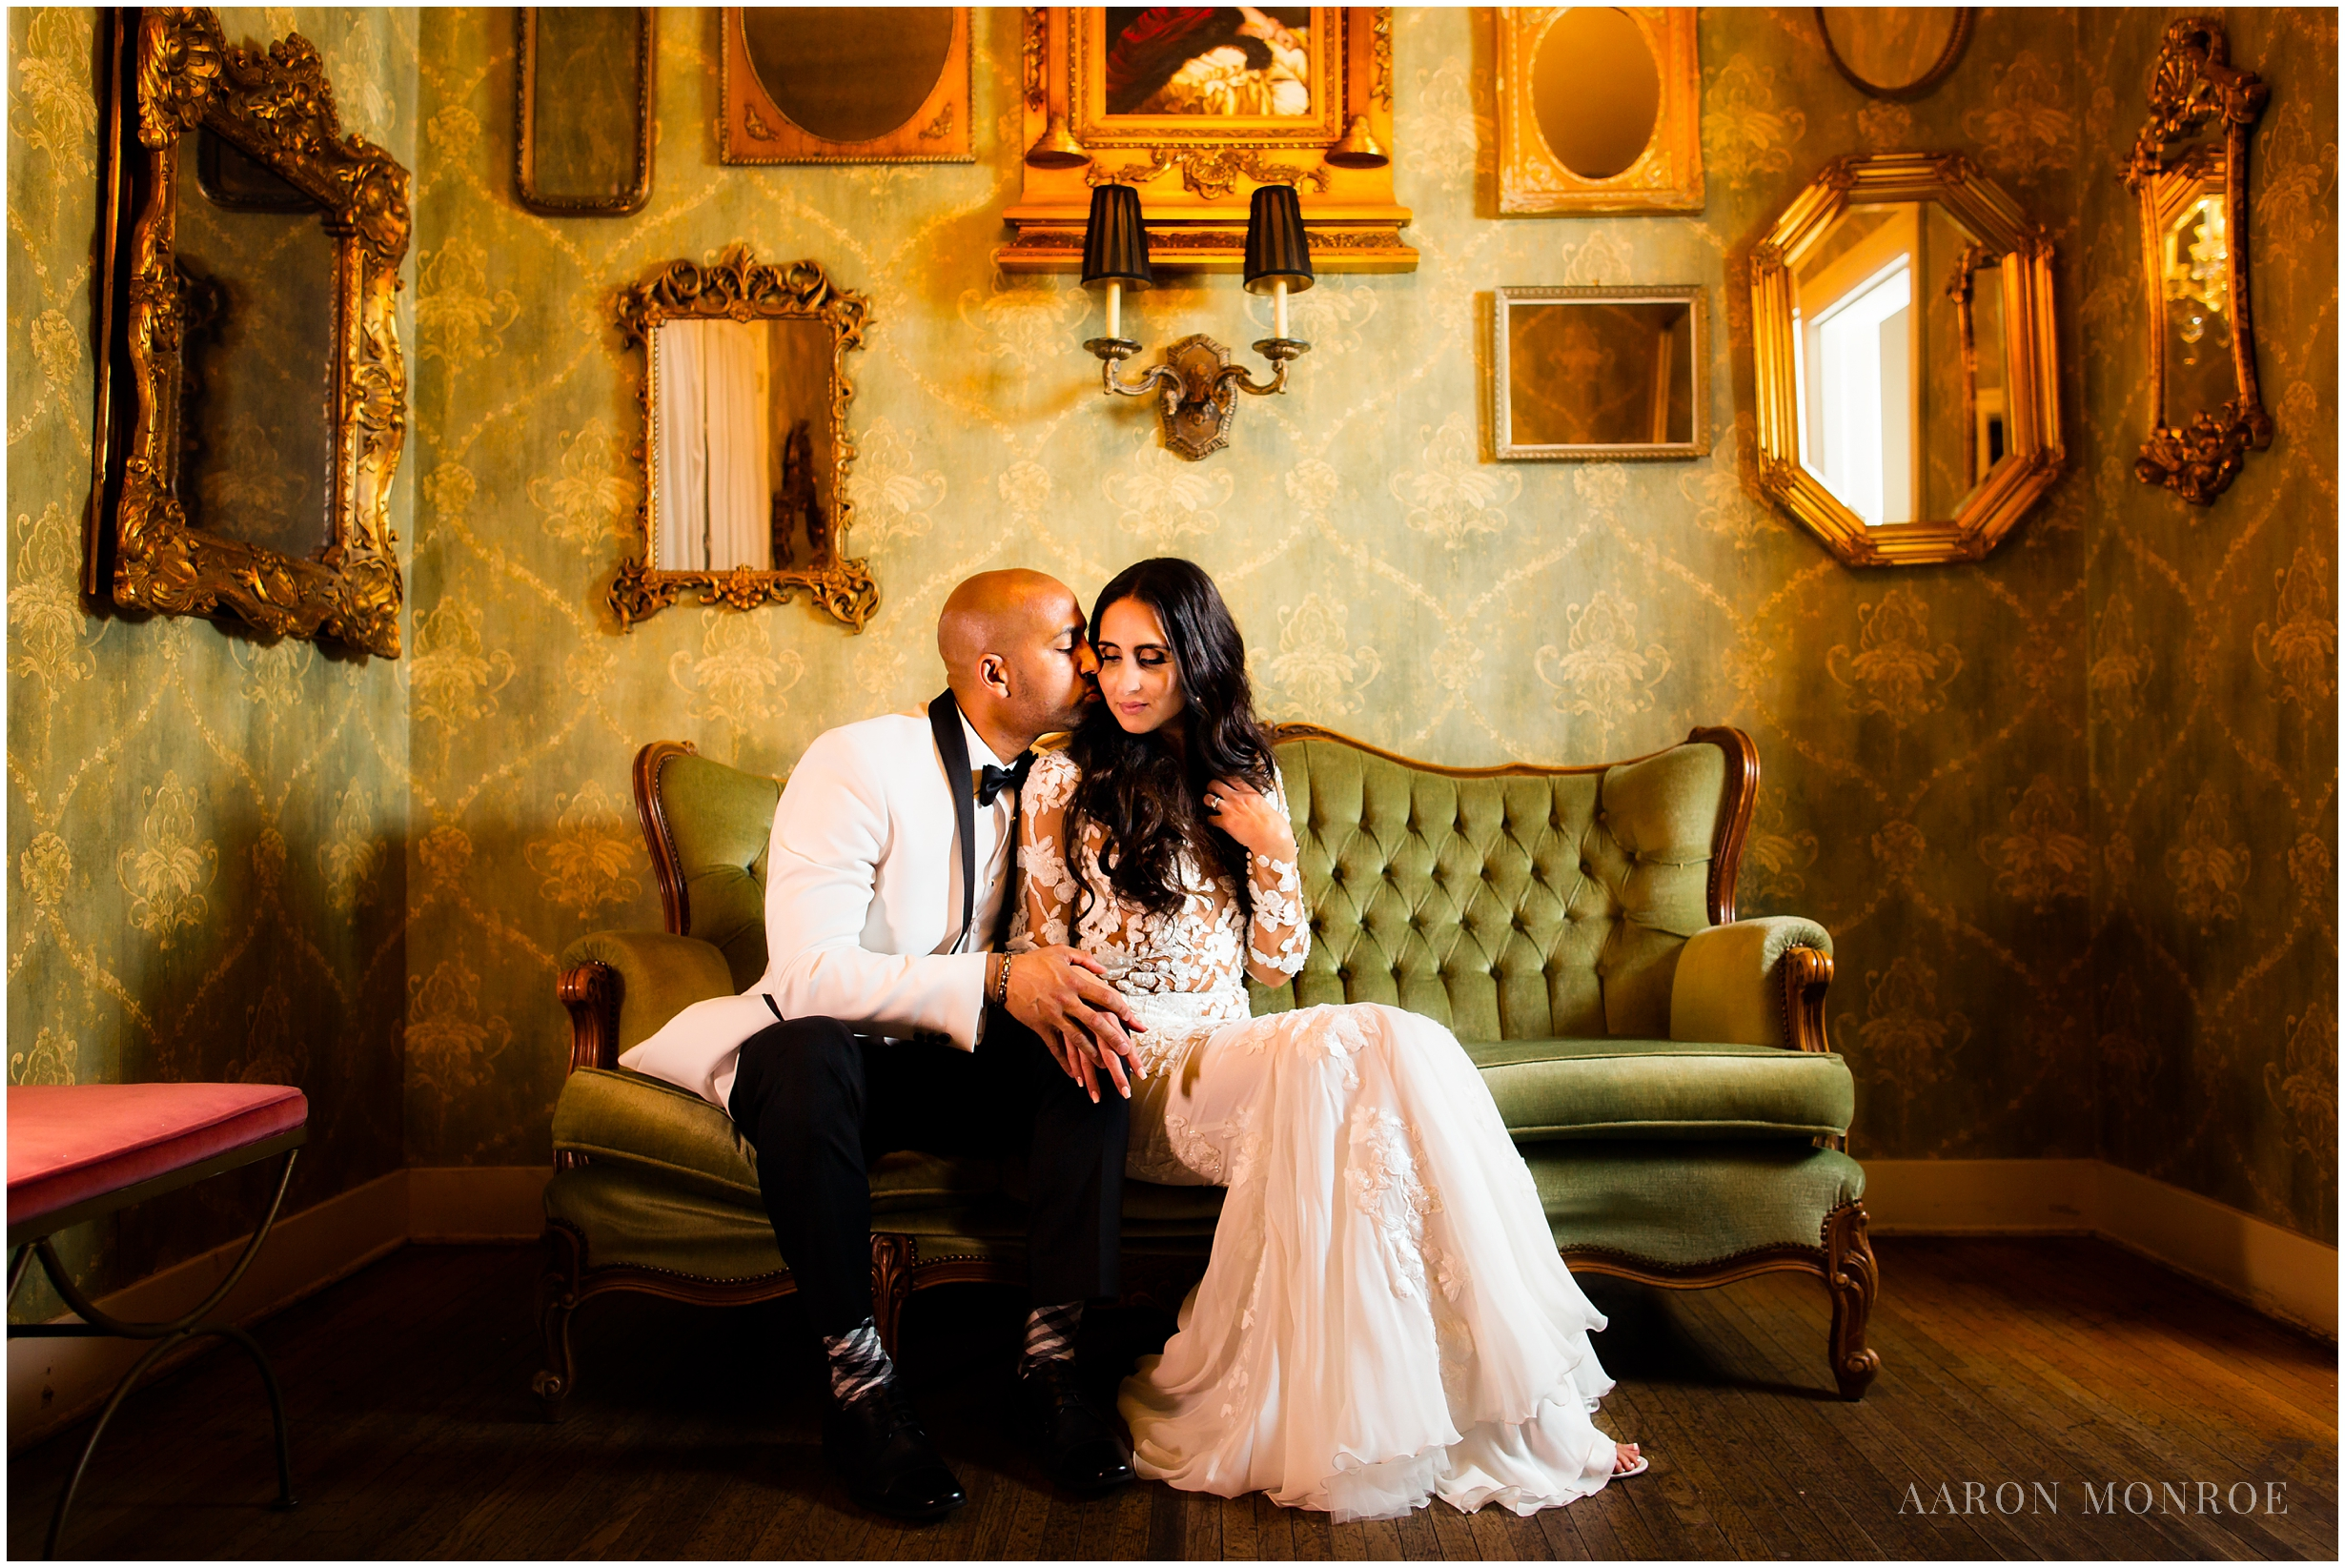 Ebell_Long_Beach_Wedding_Photography_0889.jpg